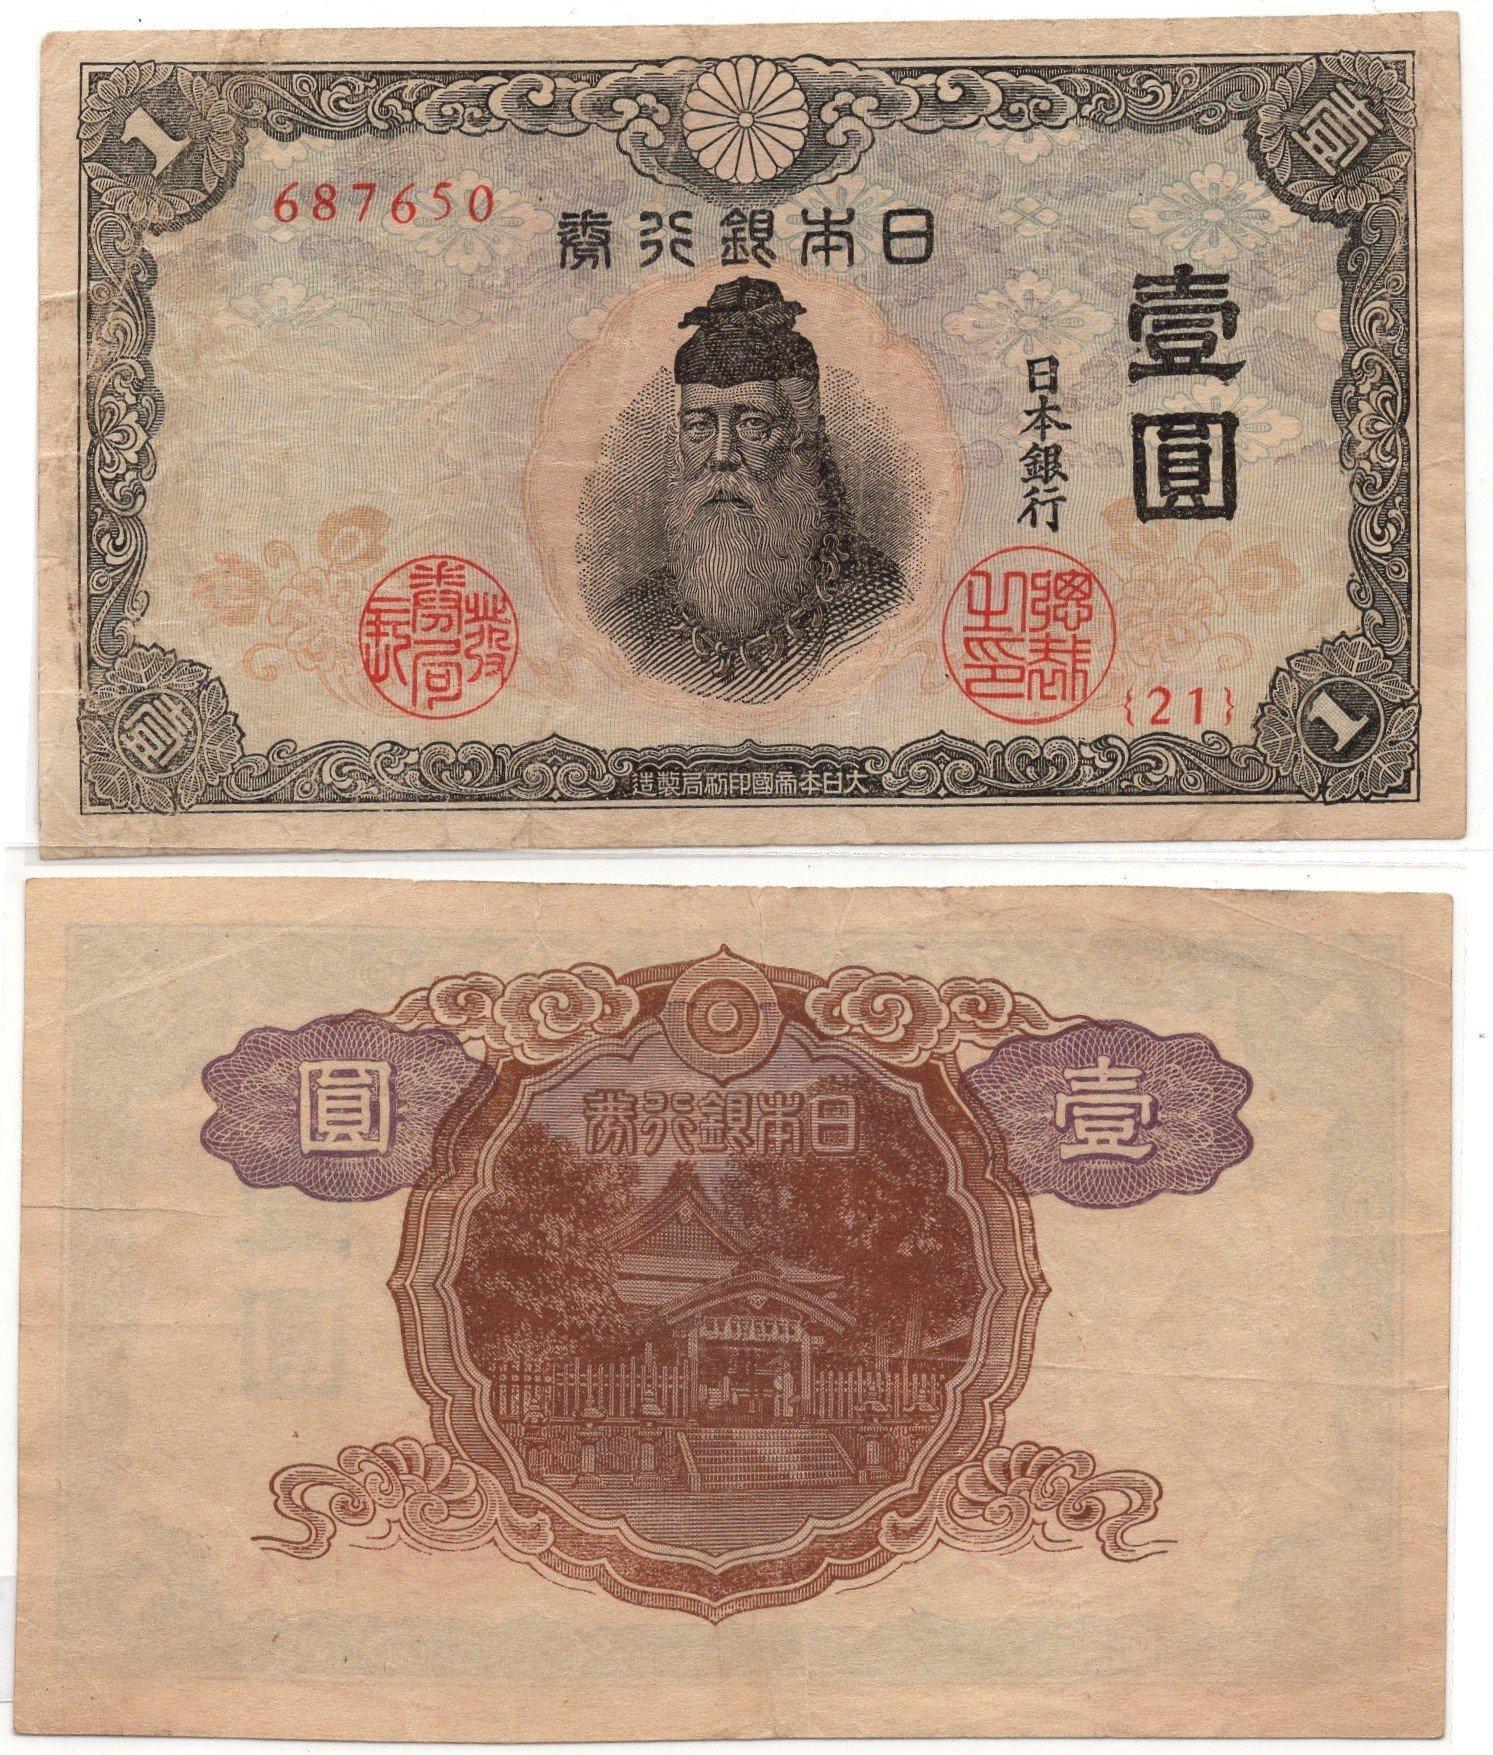 Japan 1 Yen 1944 P54